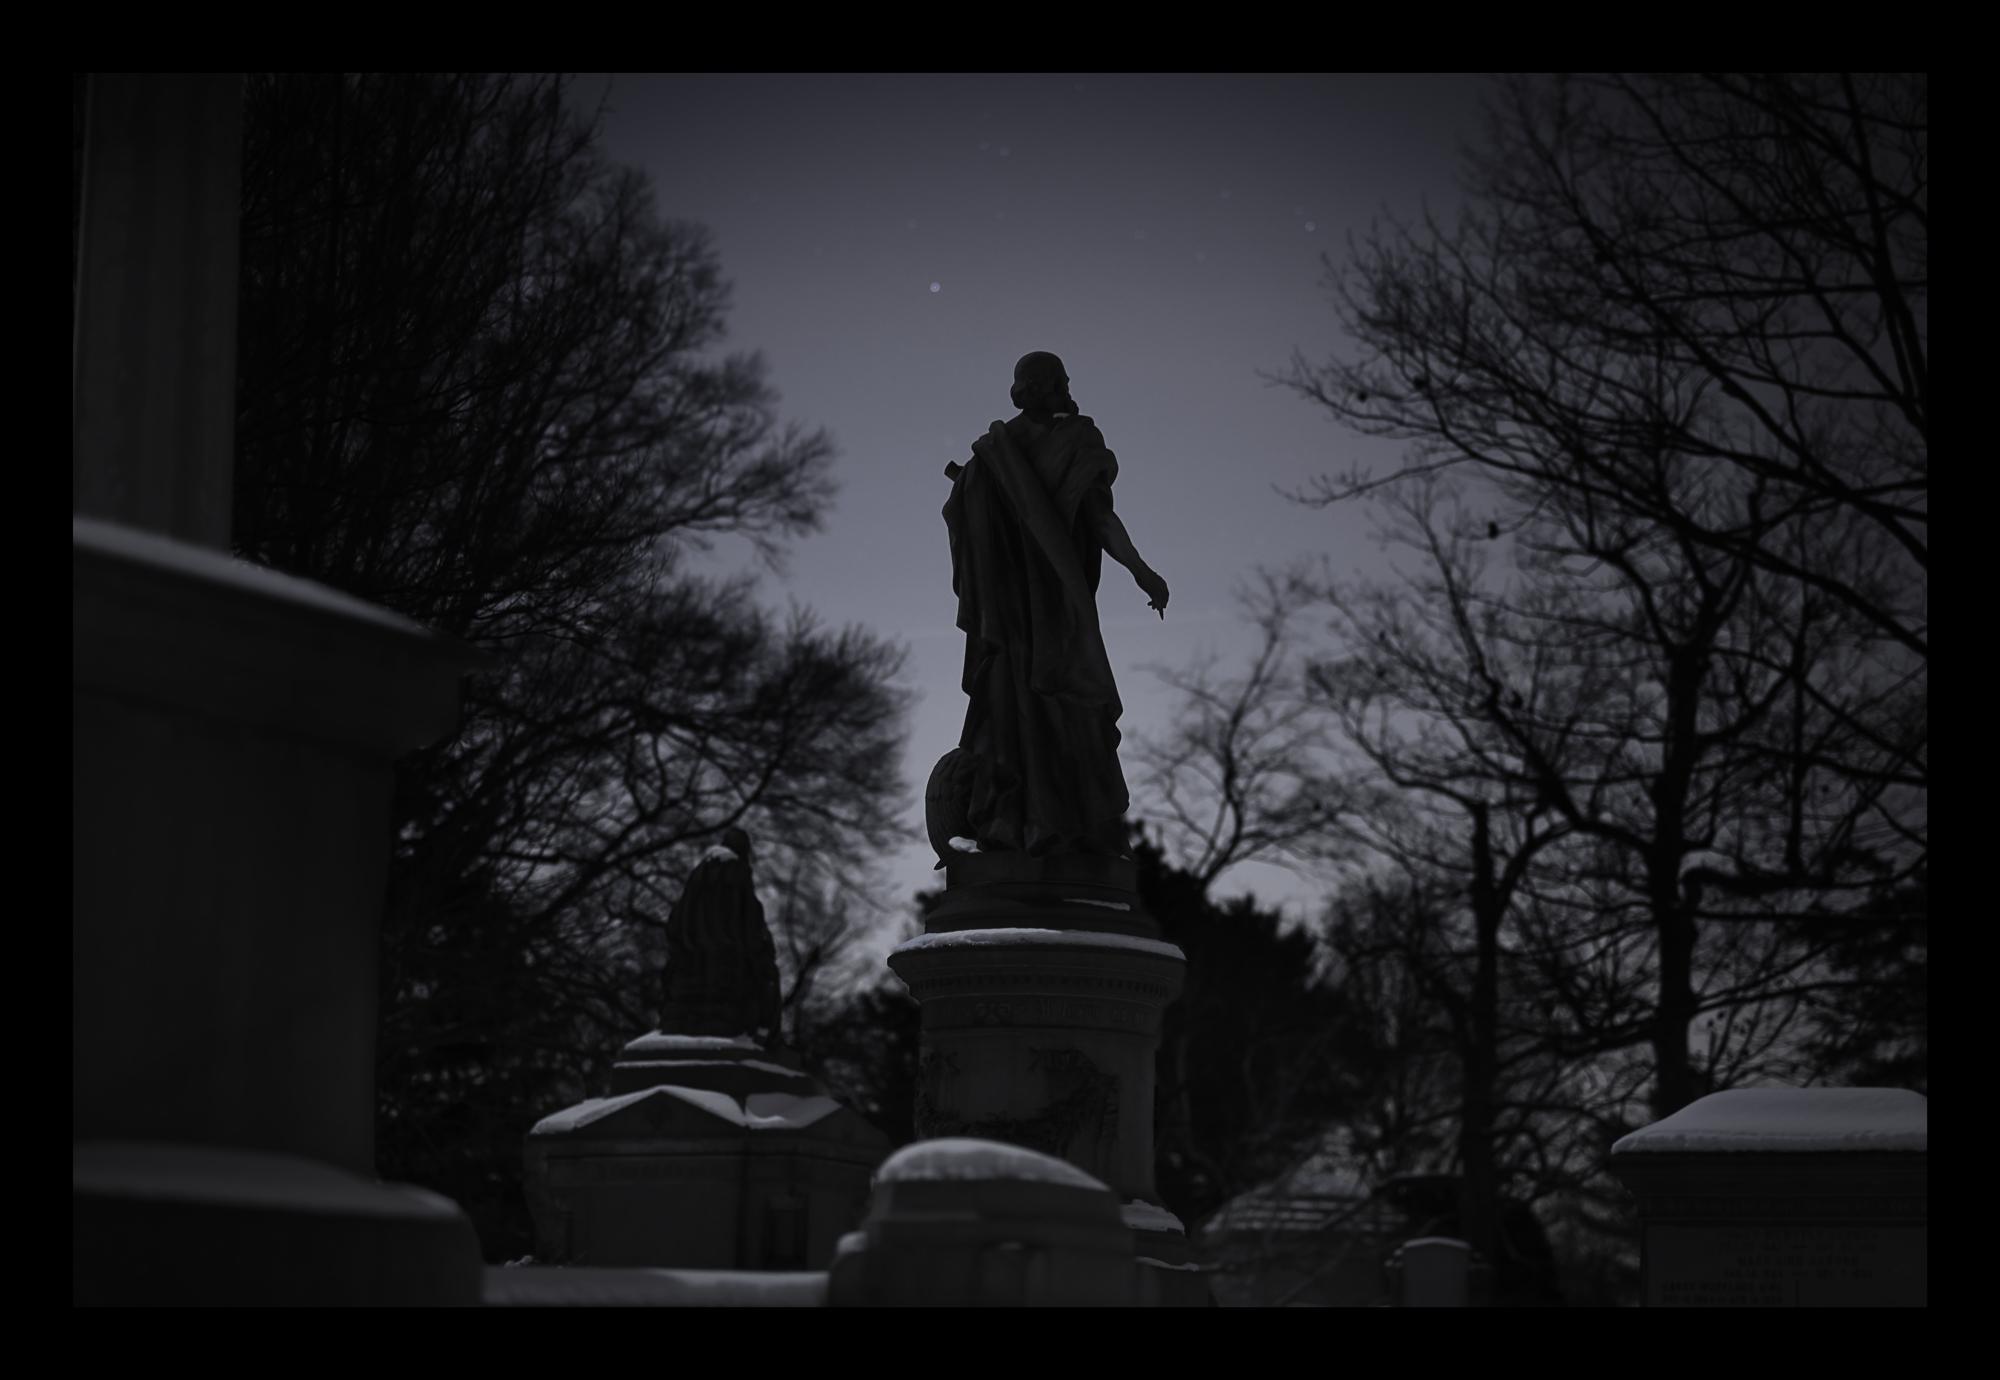 L1005169 Documenting the Night flt LP.jpg